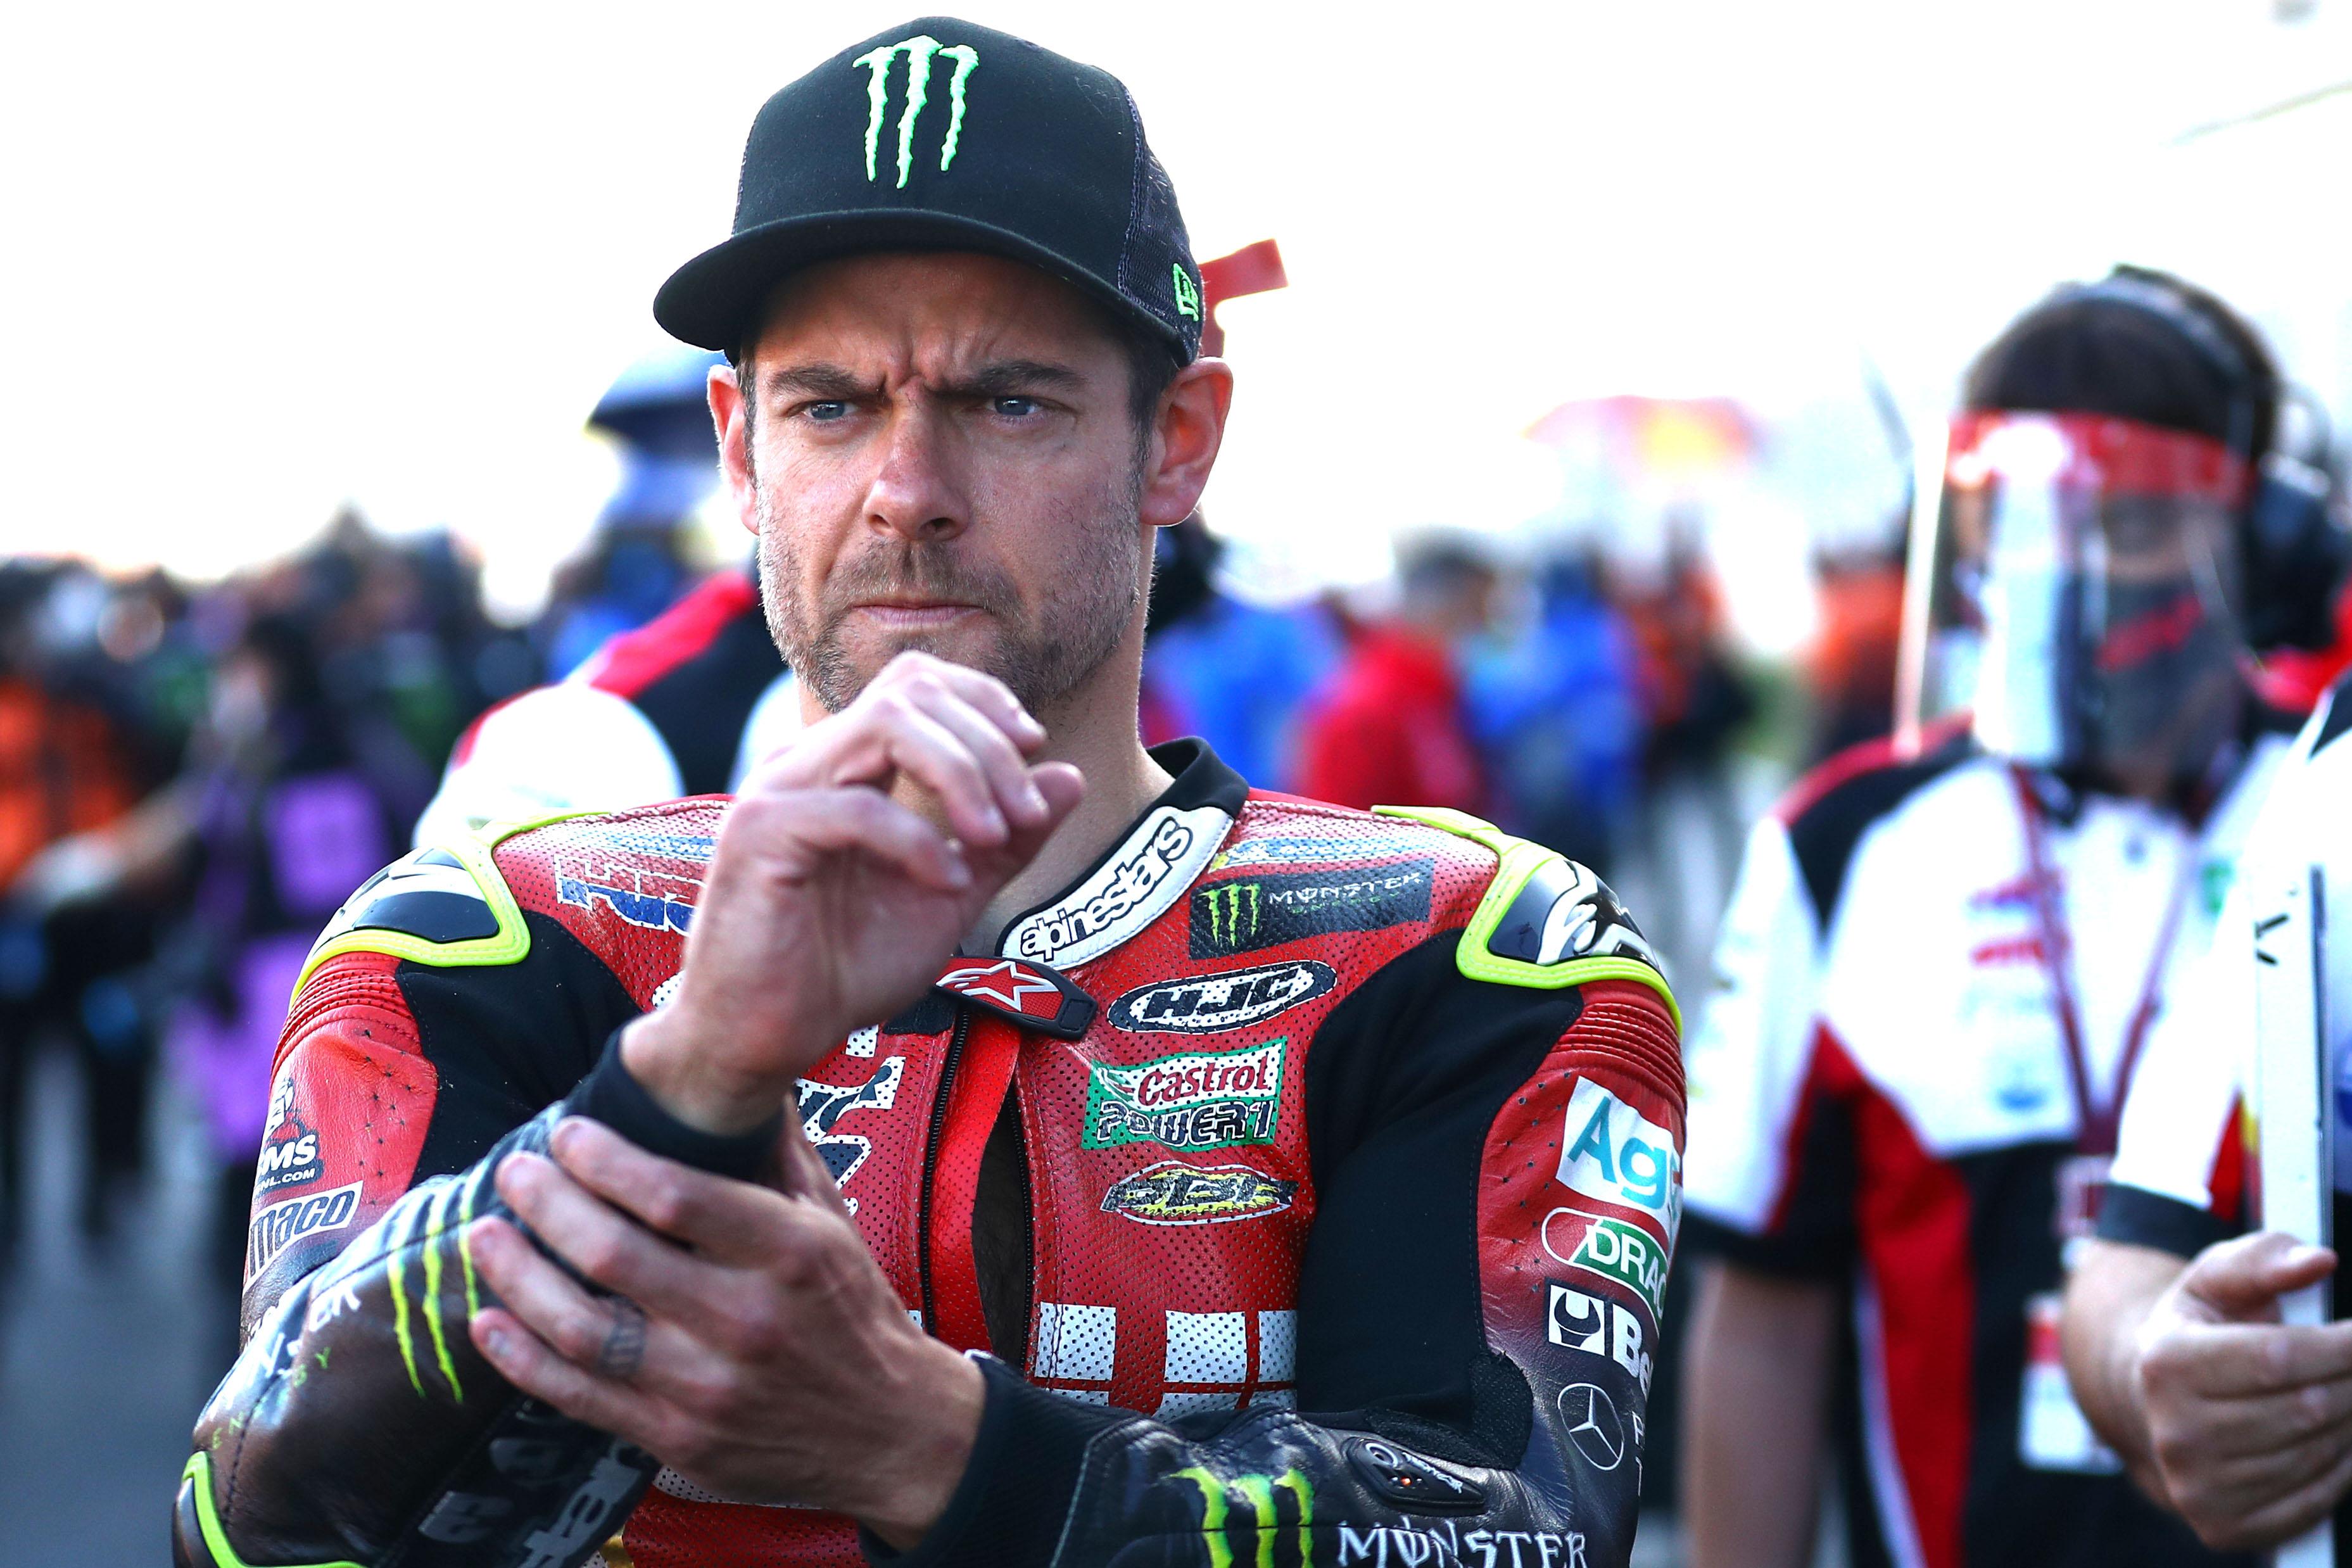 Cal Crutchlow wildcard MotoGP 2020